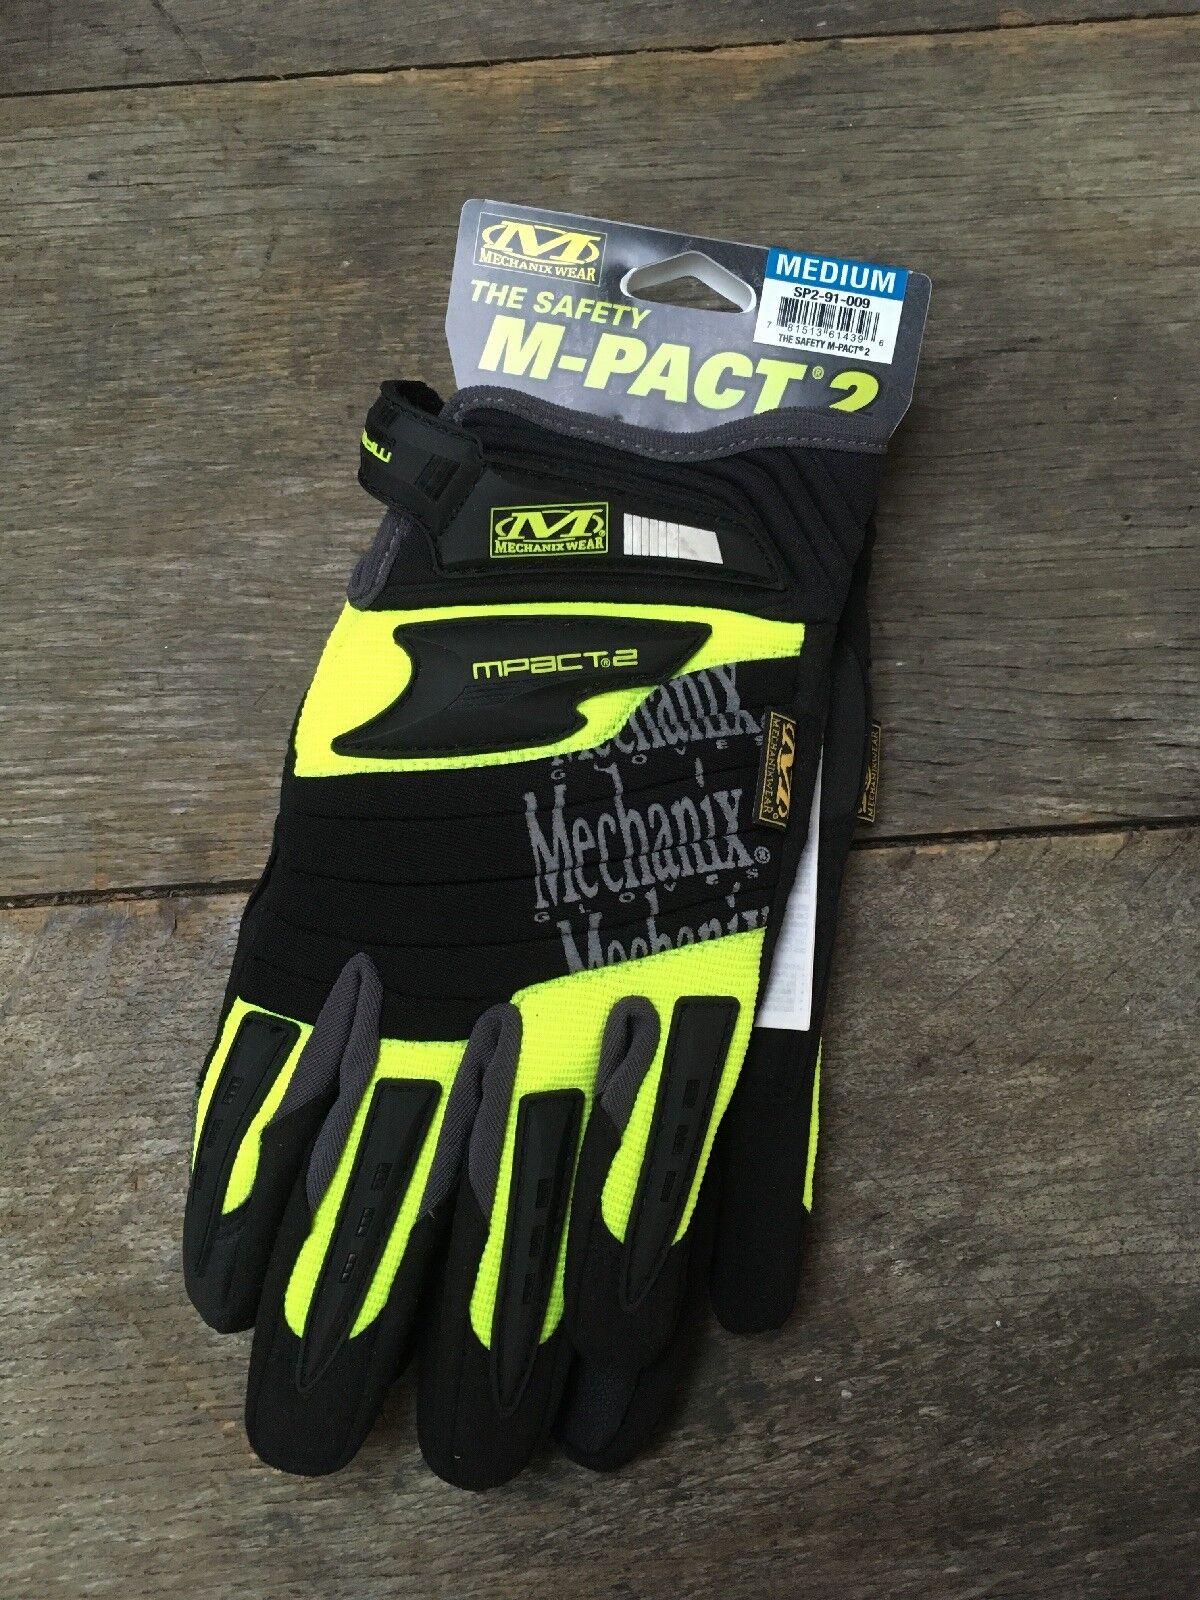 Mechanix Wear  The Safety M-Pact 2 Hi-Viz Day Glow Green SP2-91-009 M Medium BNWT  fashion